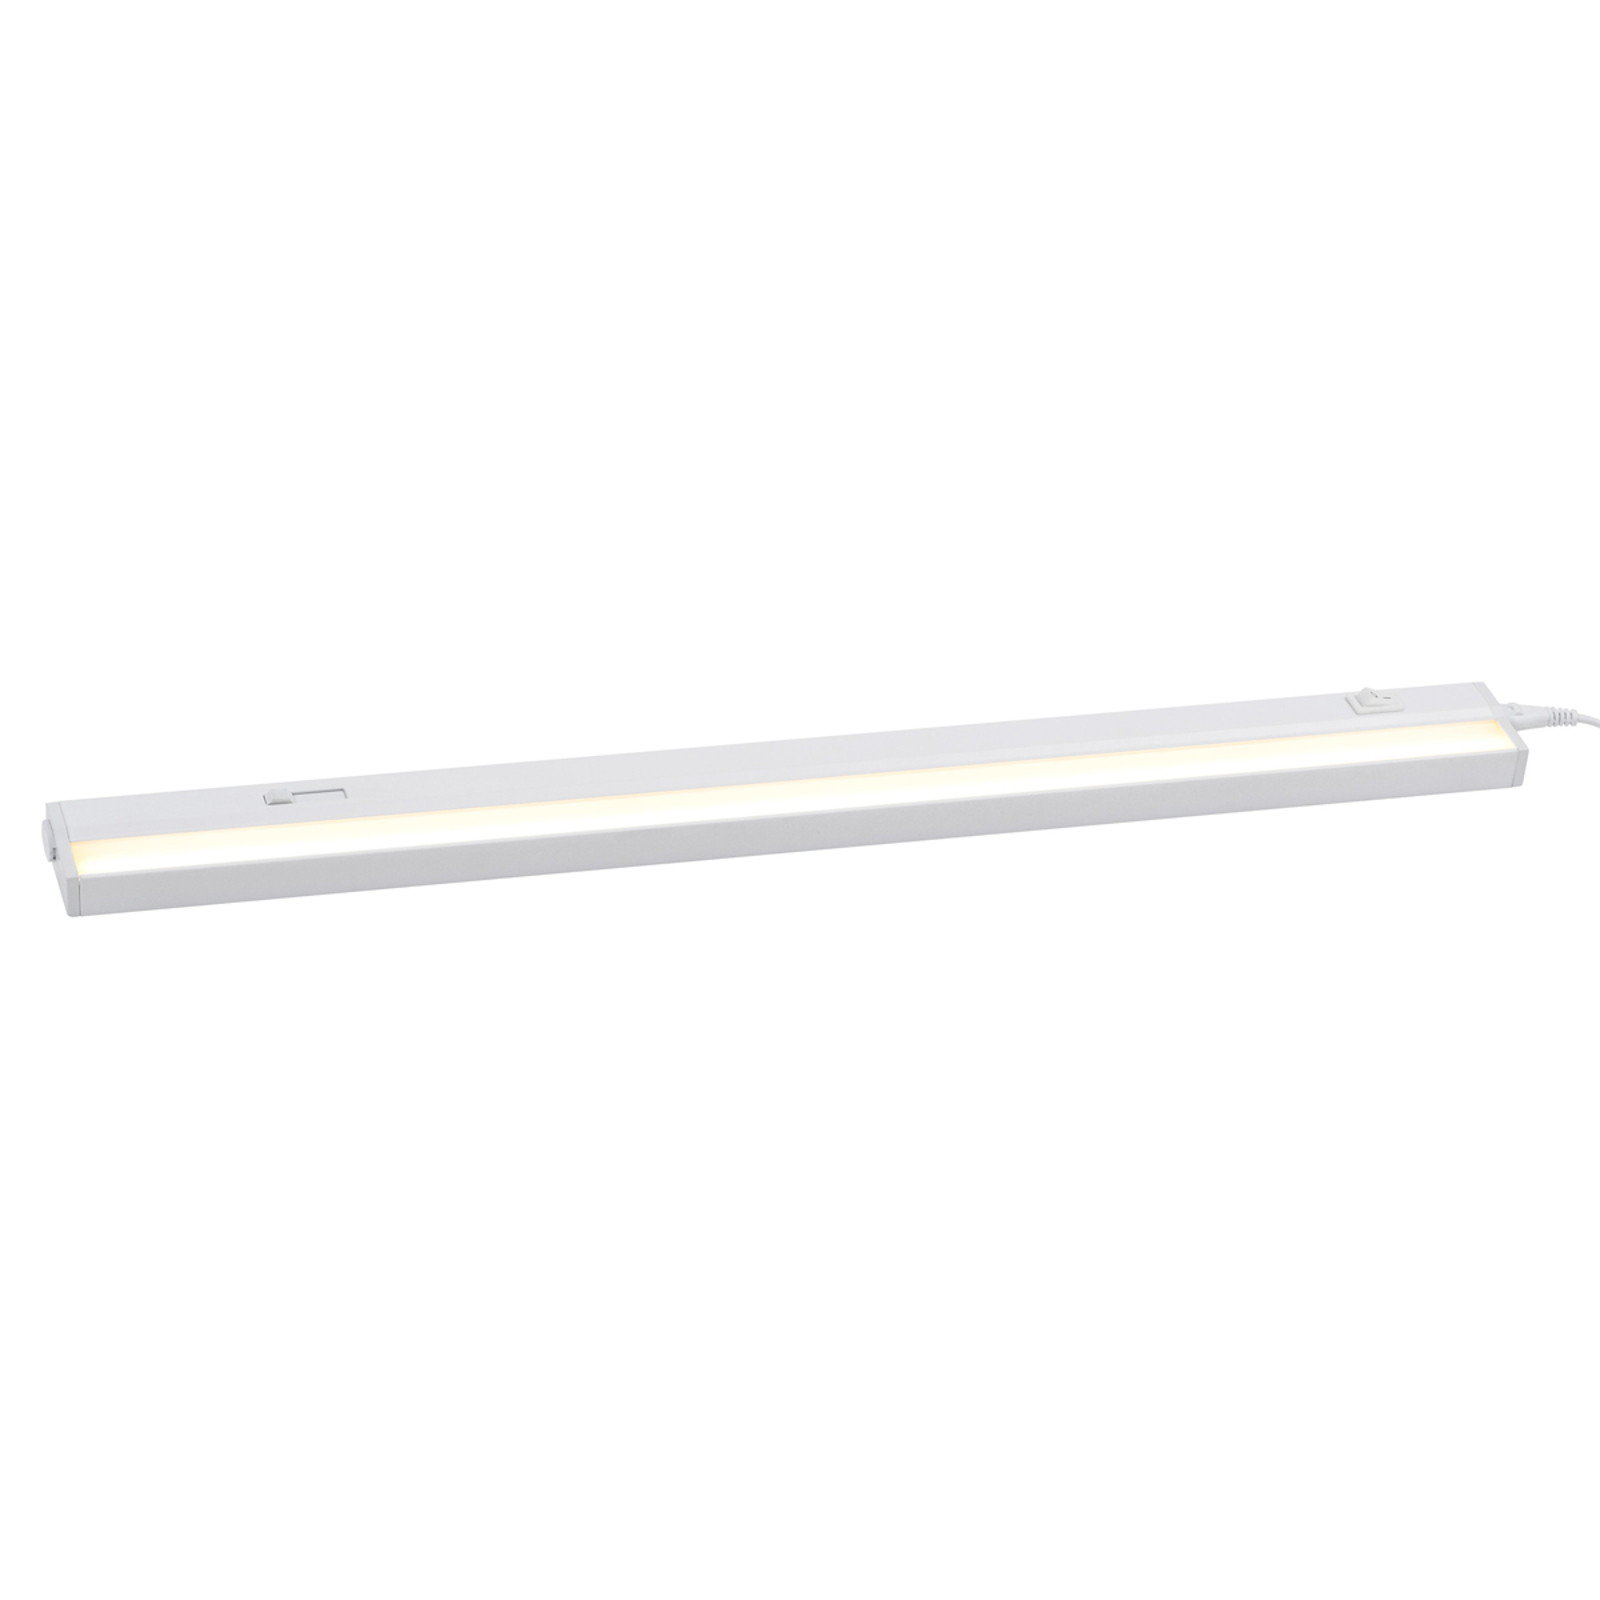 LED-kaapinalusvalaisin Cabinet Light 60,9 cm